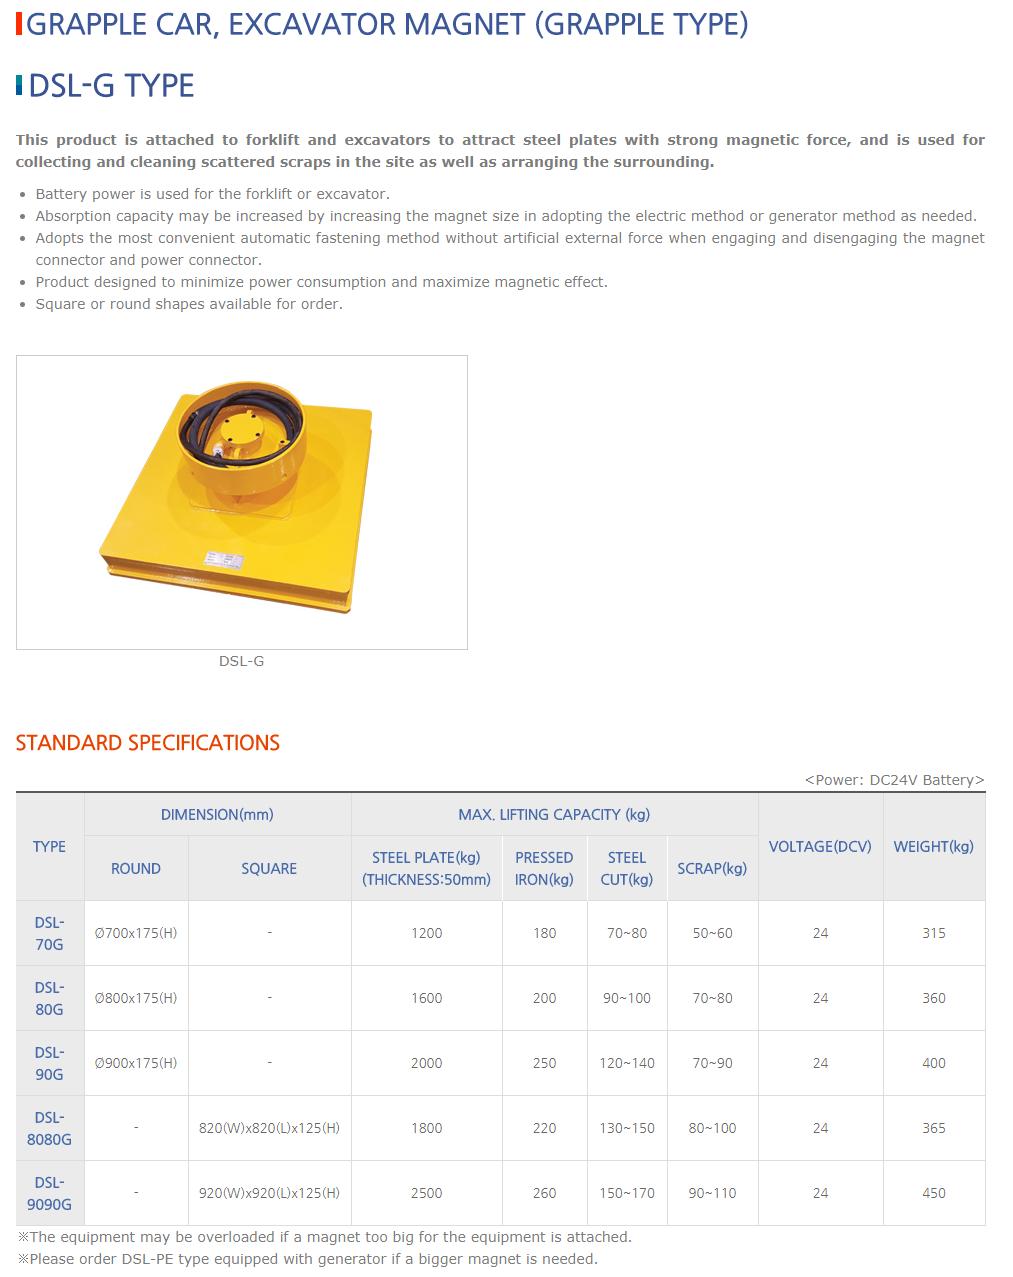 DAESUNG MARGNET Grapple Car, Excavator Magnet (Grapple Type) DSL-G Type